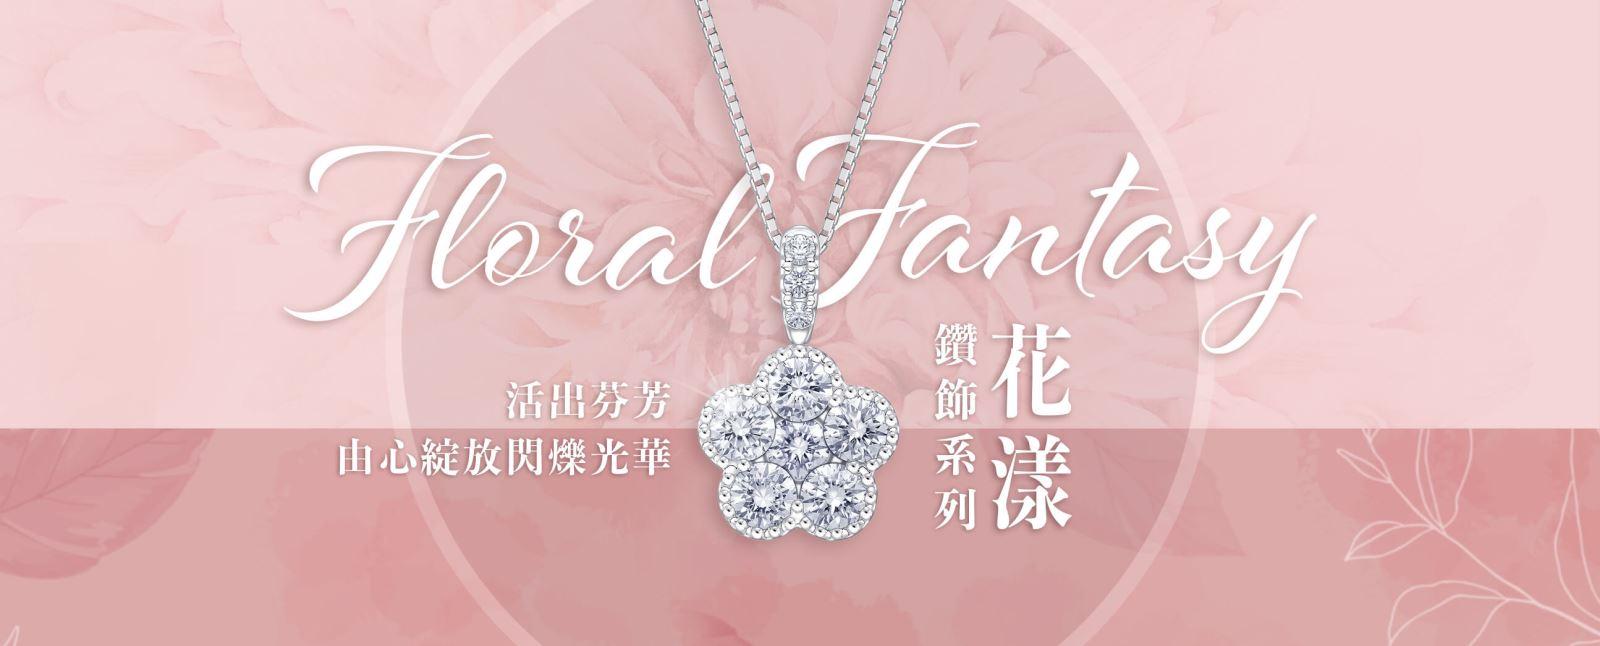 floral-fantasy-collection